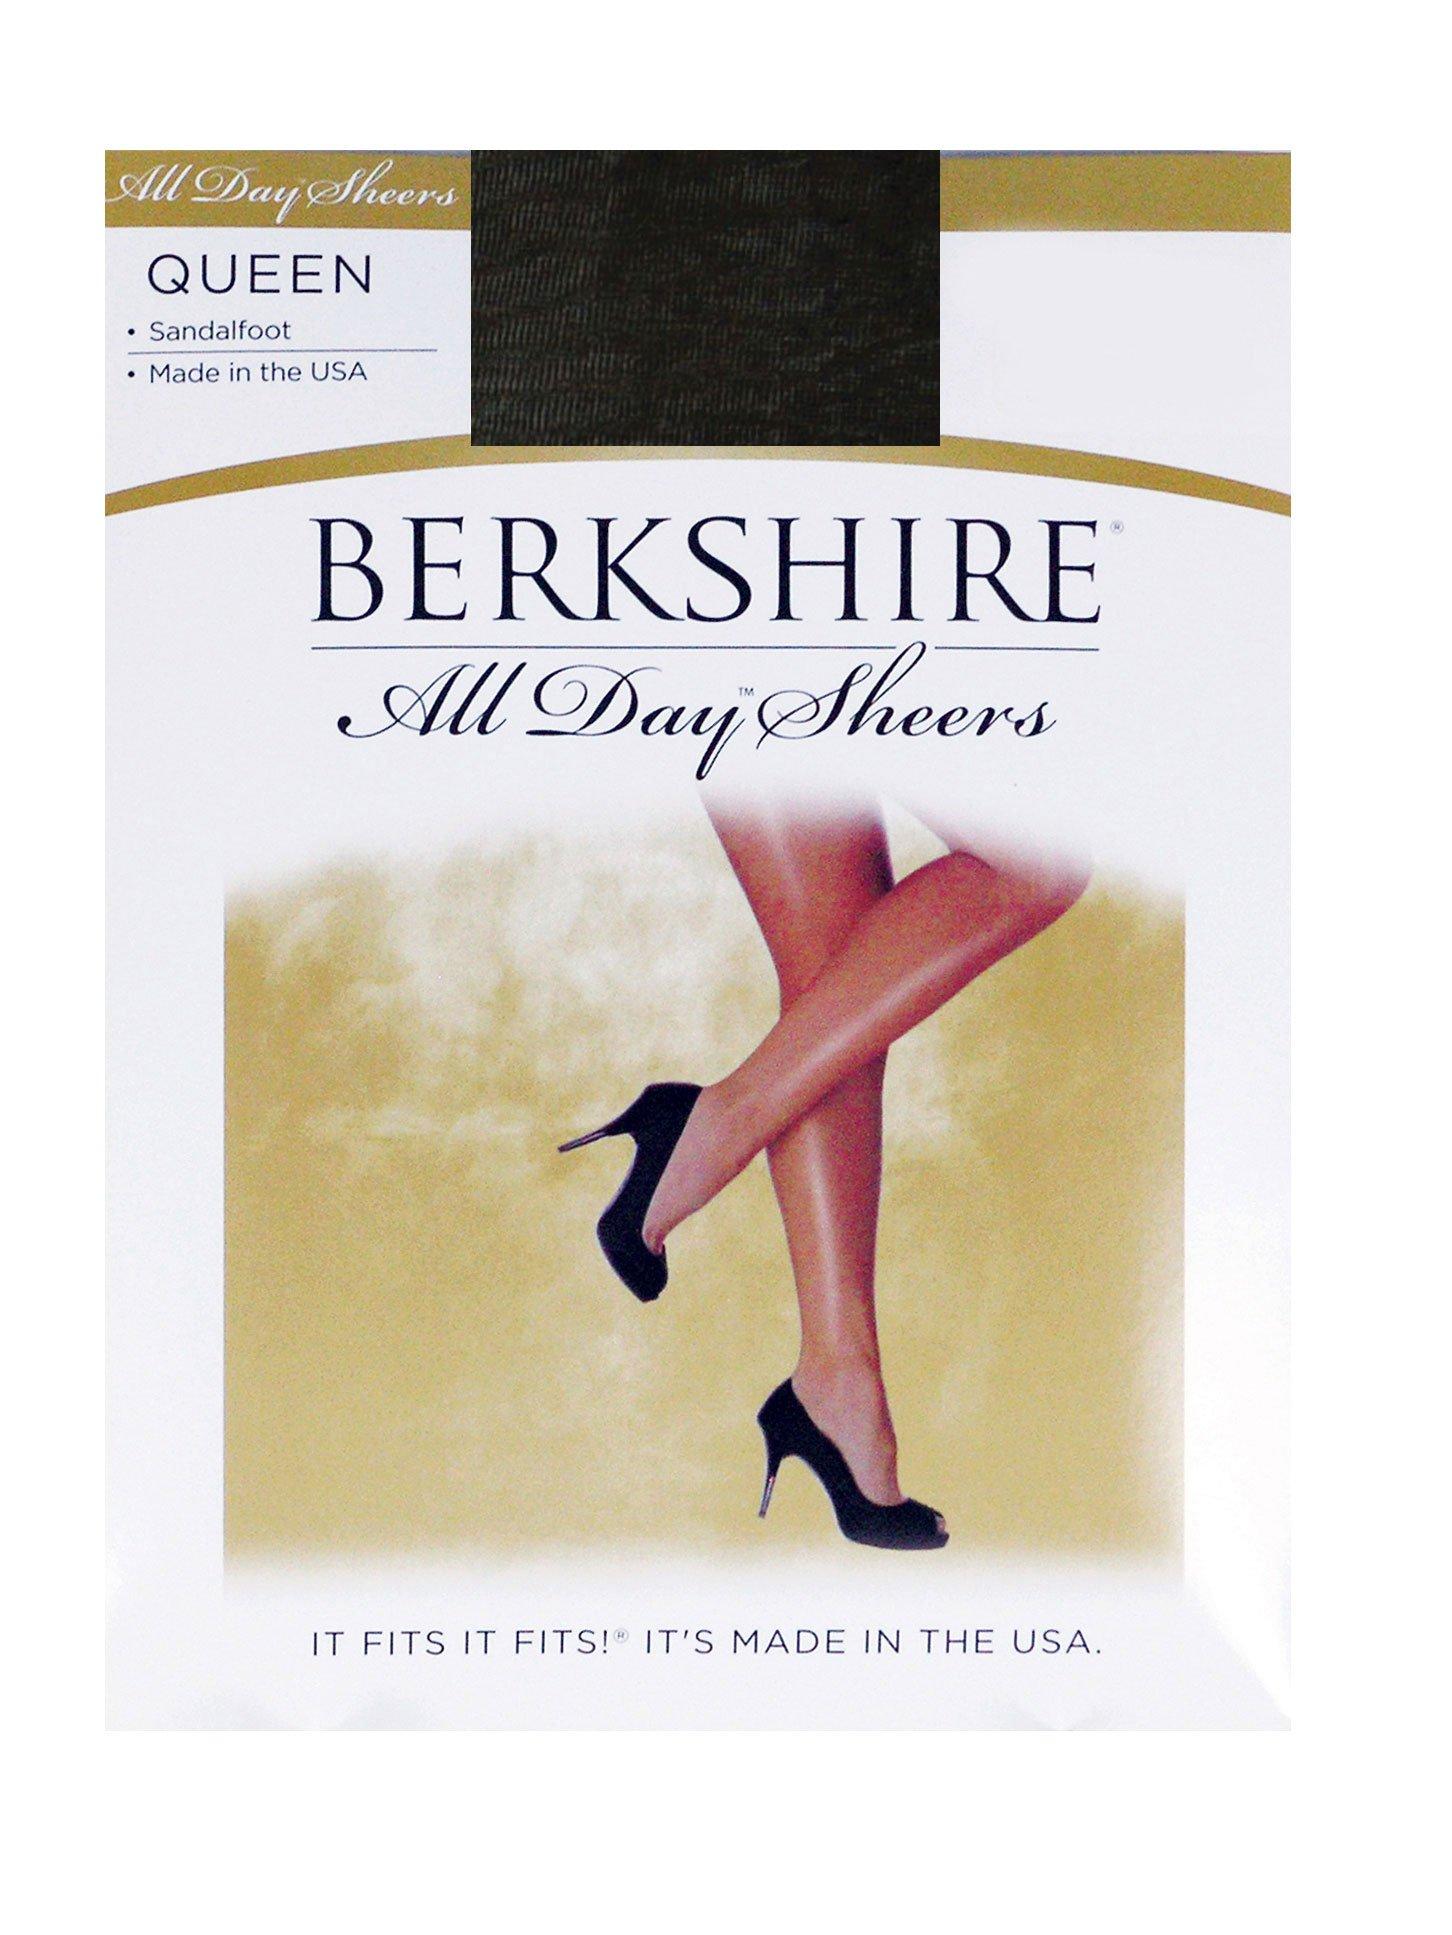 Berkshire Women's Plus-Size Queen All Day Sheer Pantyhose - Non Control Top Sandalfoot, Fantasy Black, Queen Petite